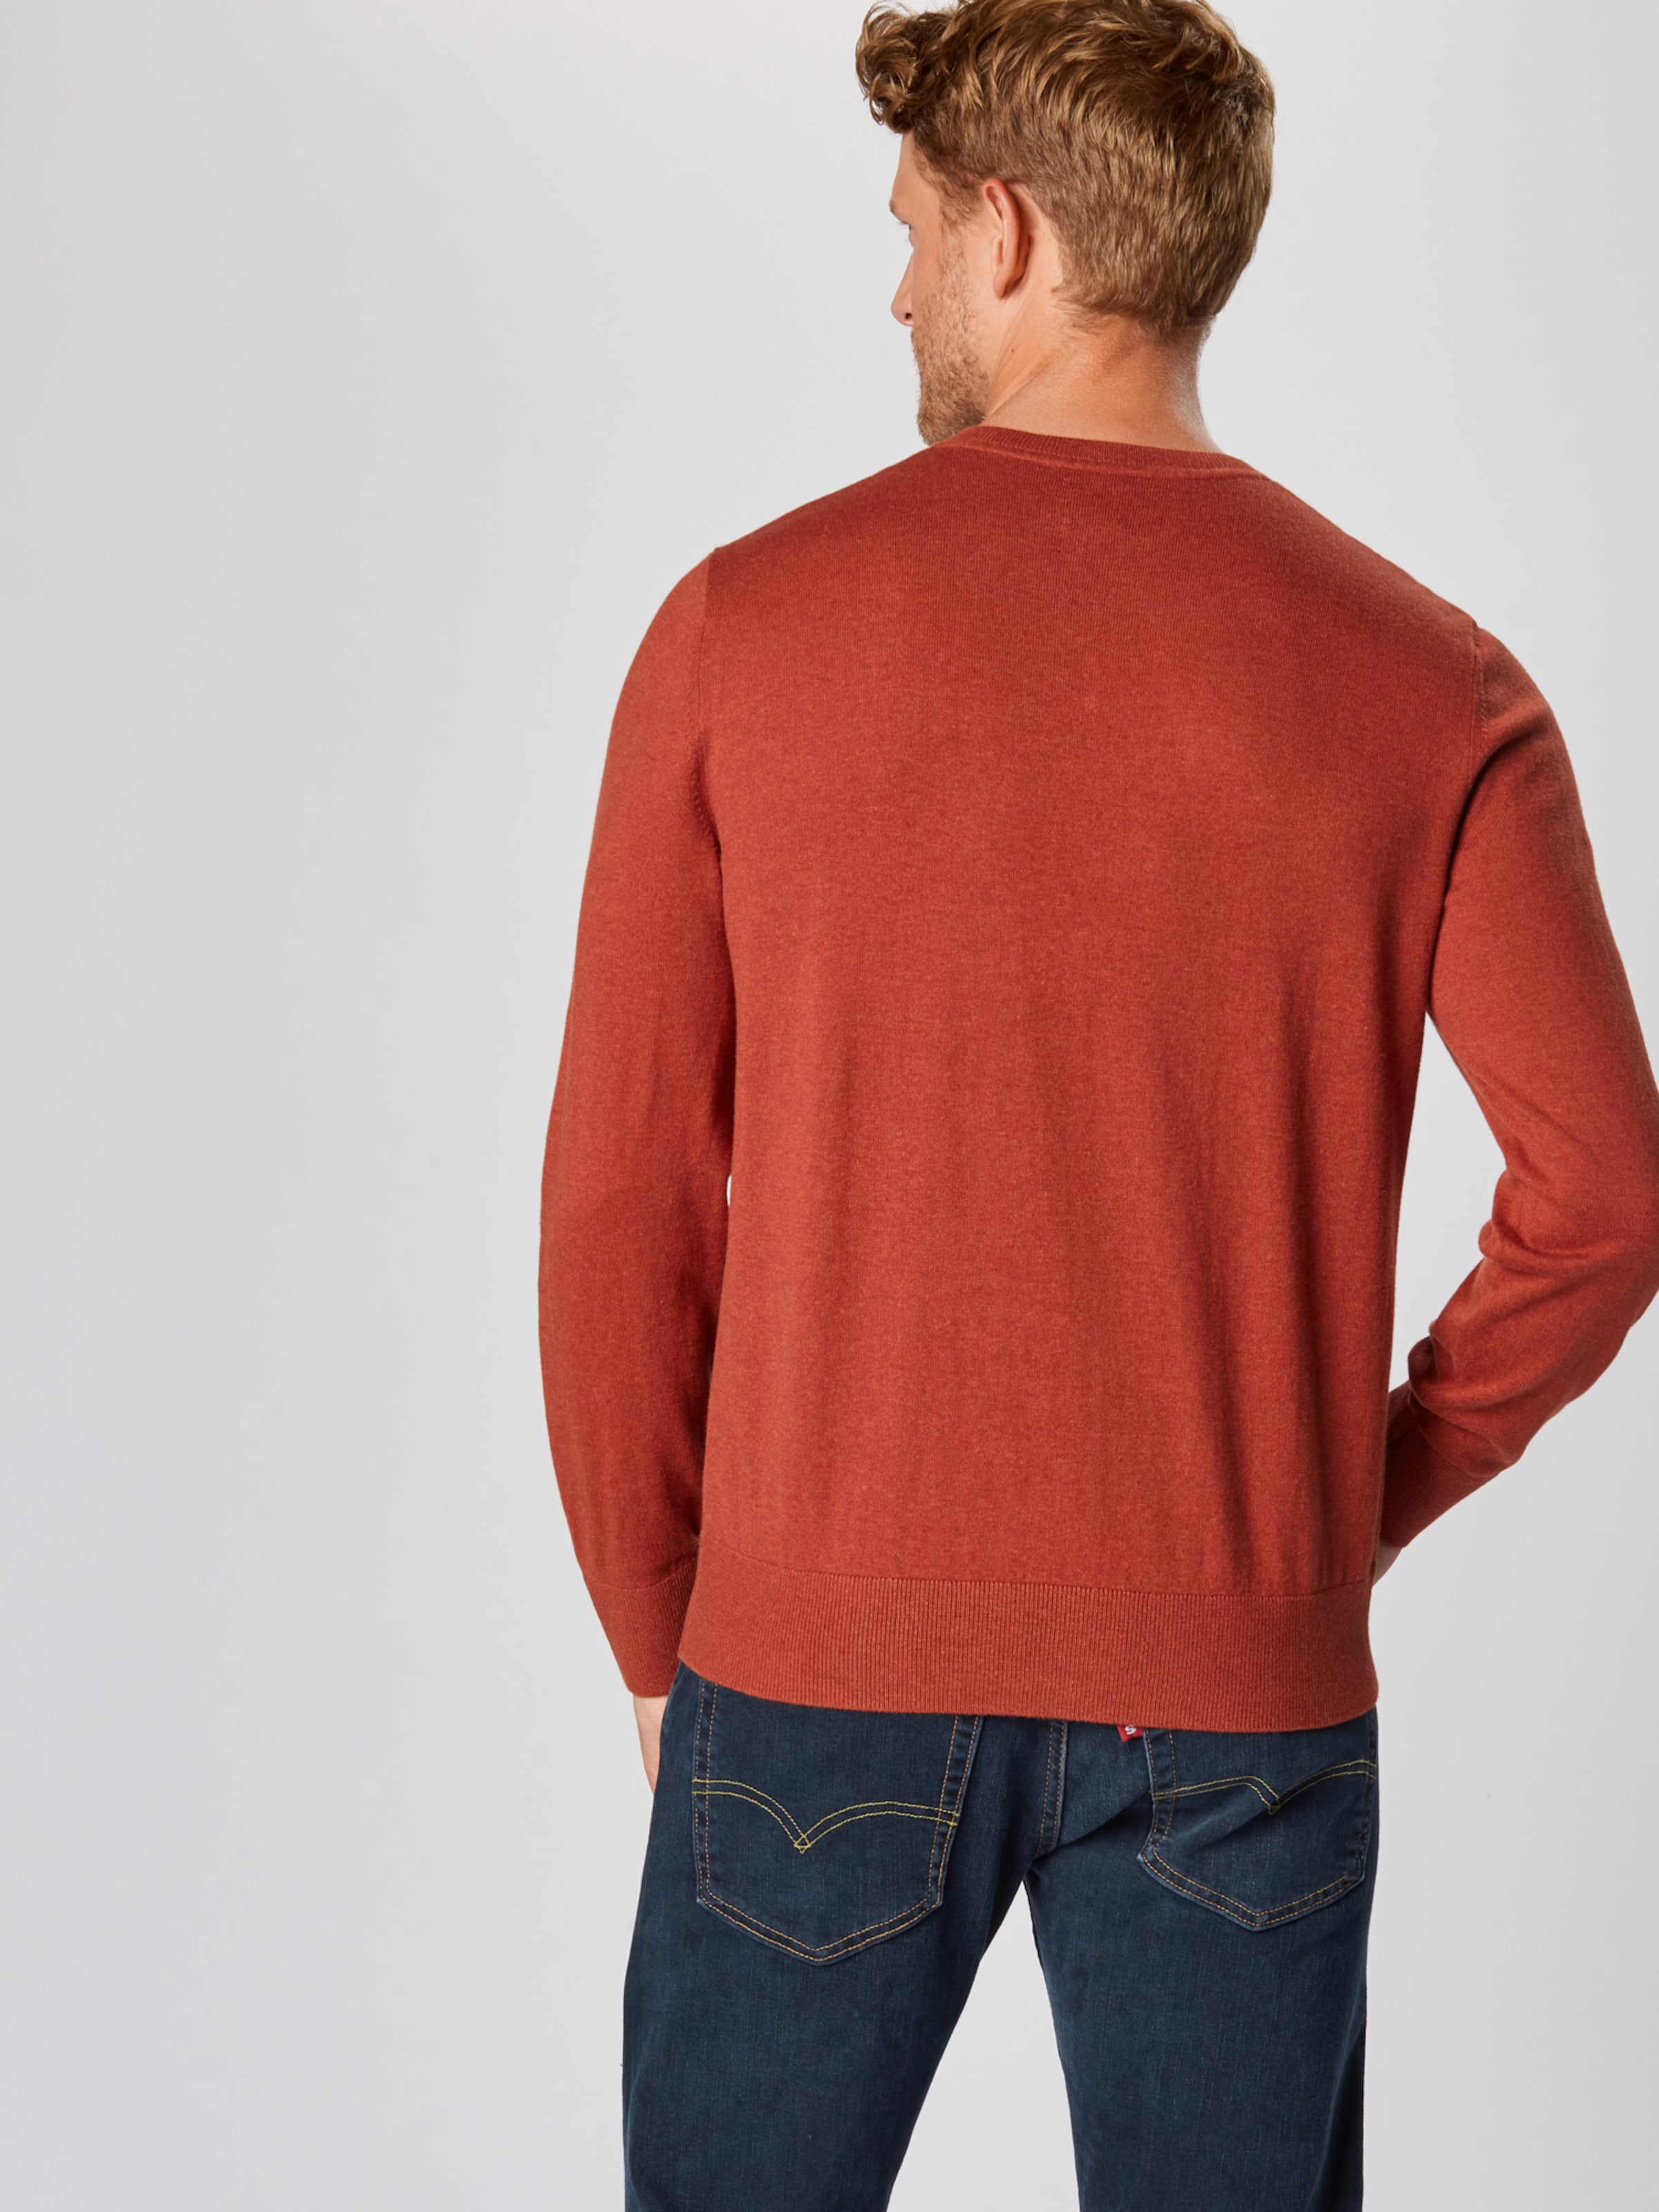 Gap core Pullover 'v Vee' Orangerot Cotton In 0X8OwnPk